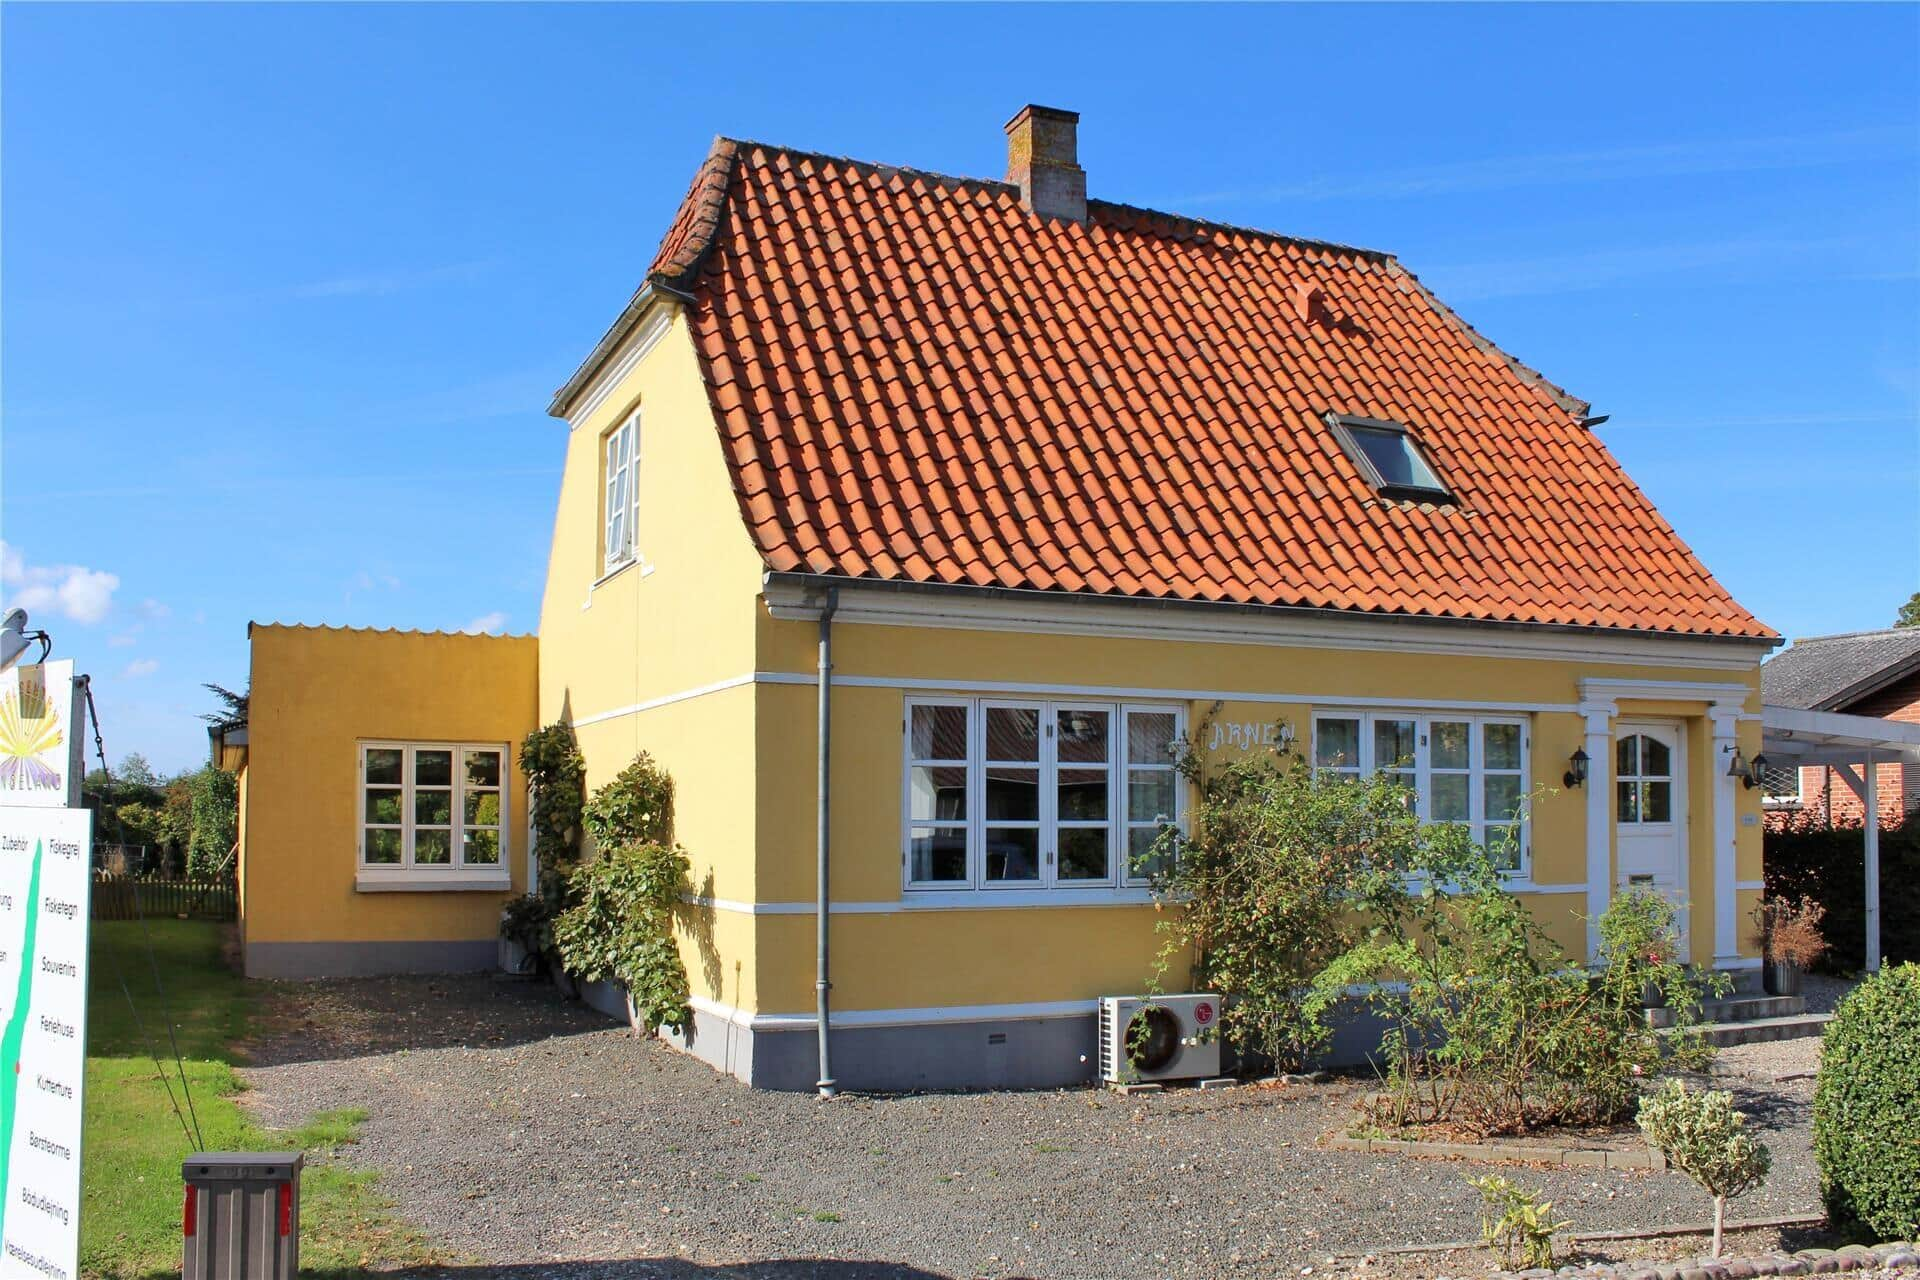 Billede 1-3 Sommerhus M67354, Spodsbjergvej 303, DK - 5900 Rudkøbing